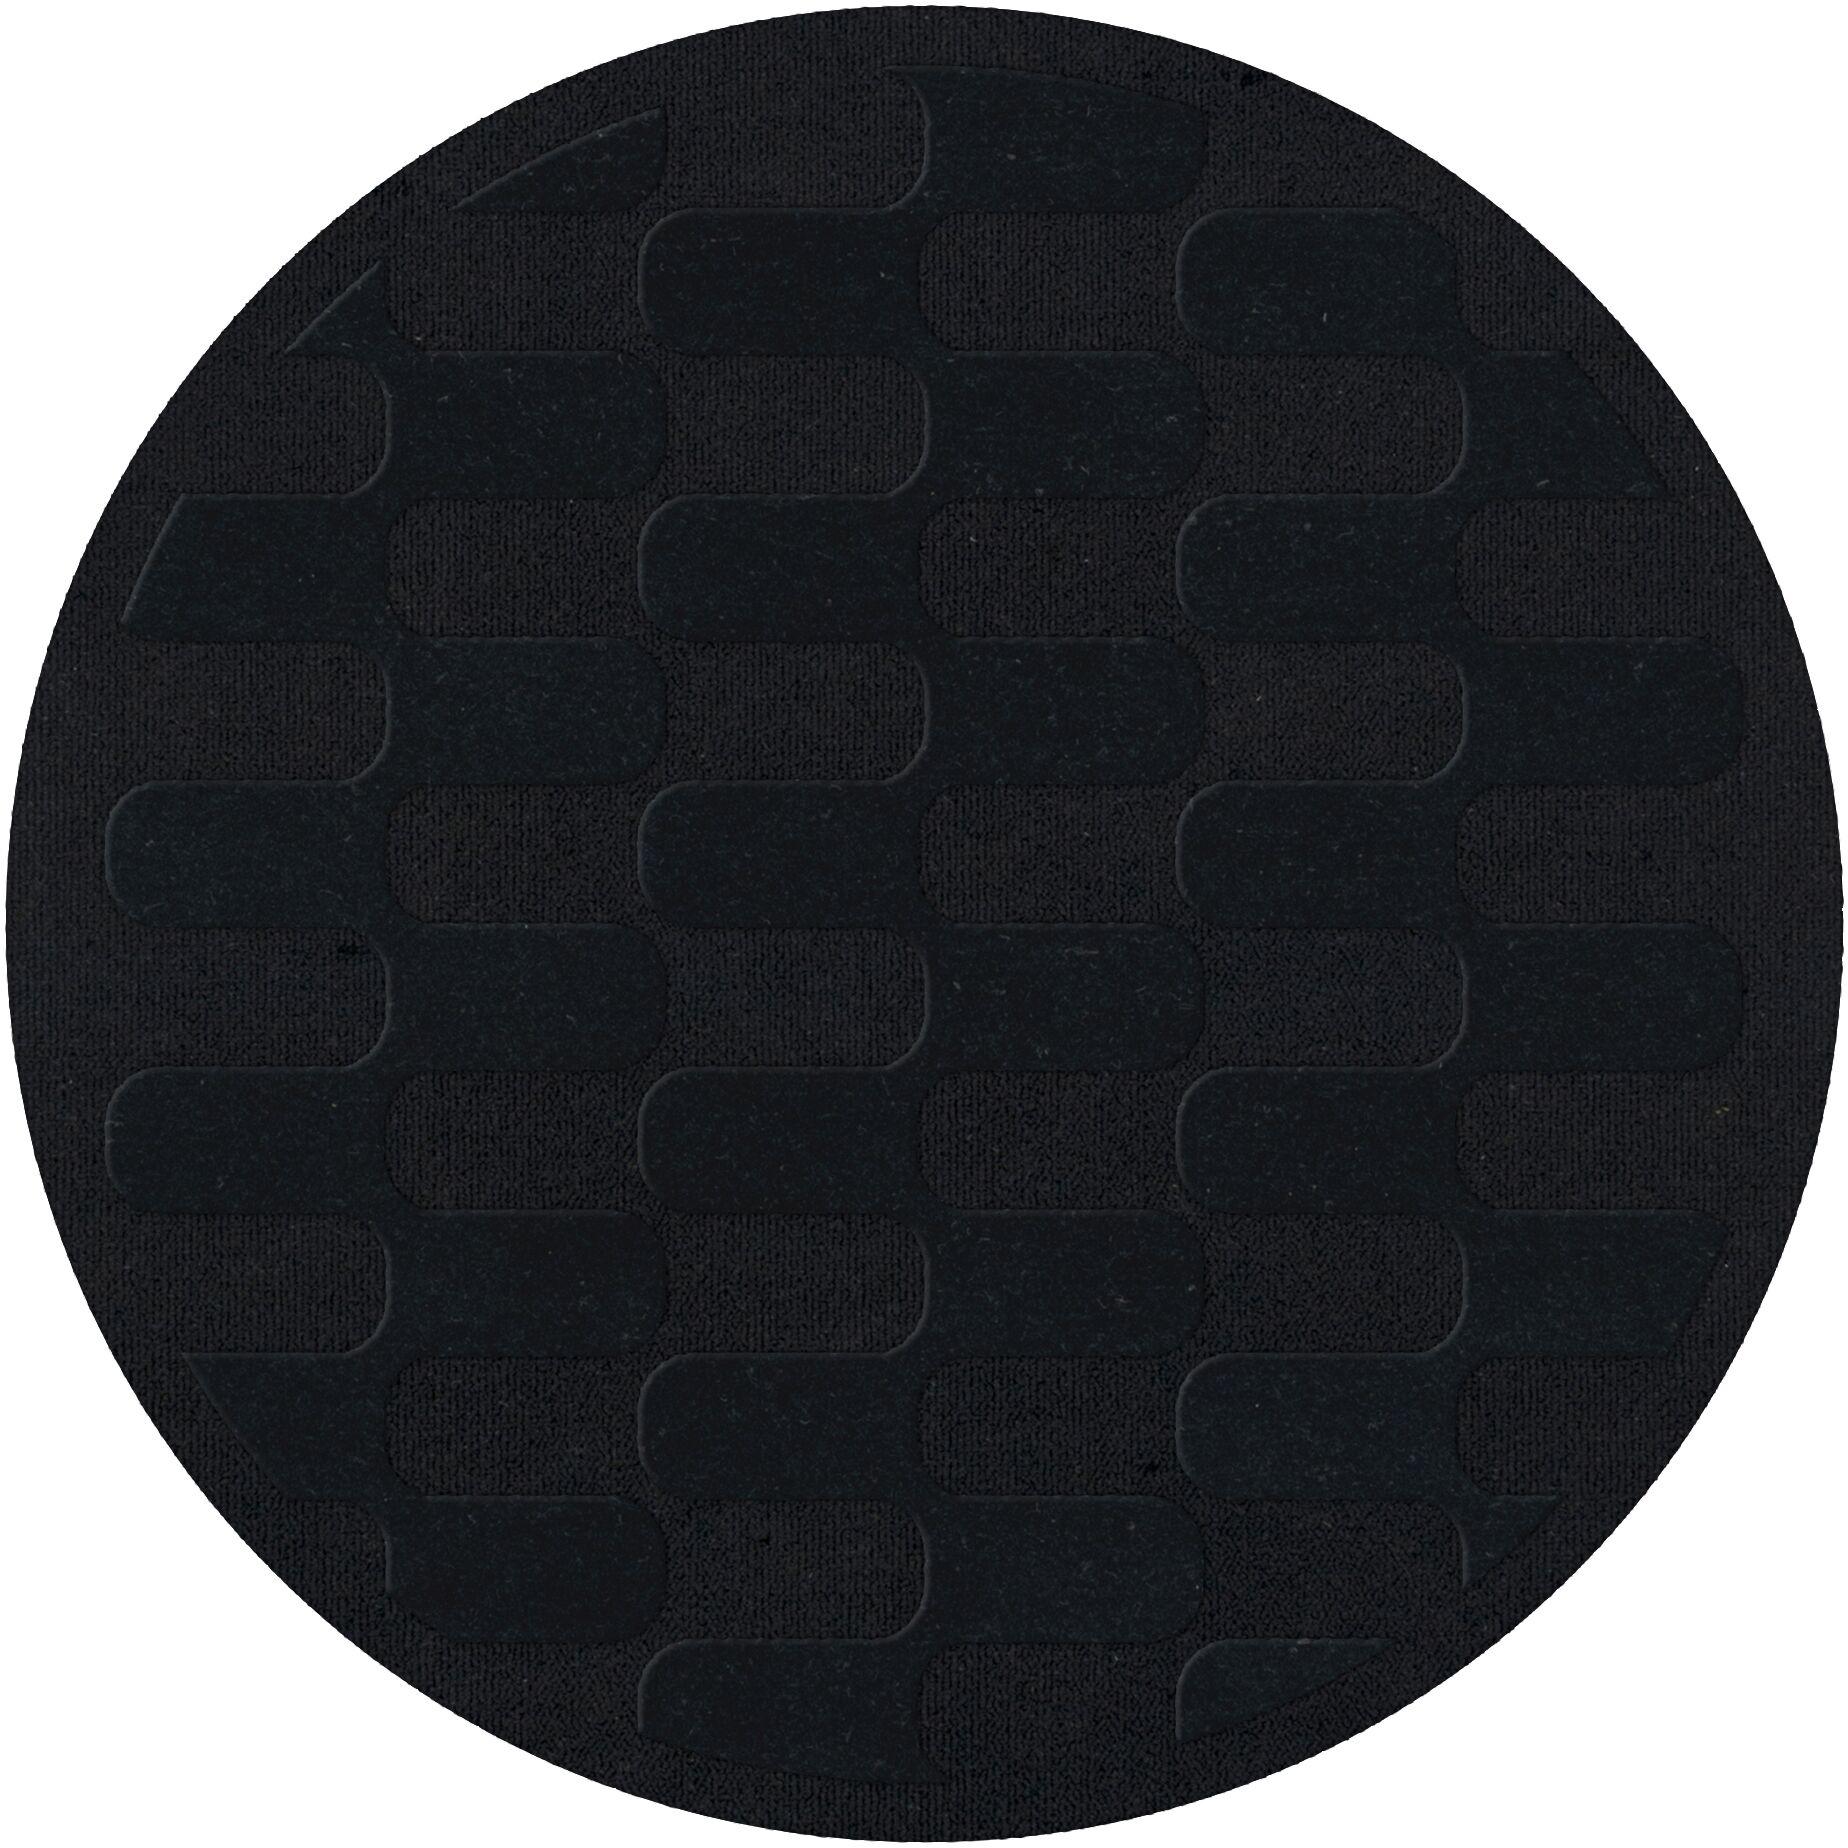 Dover Black Area Rug Rug Size: Round 10'